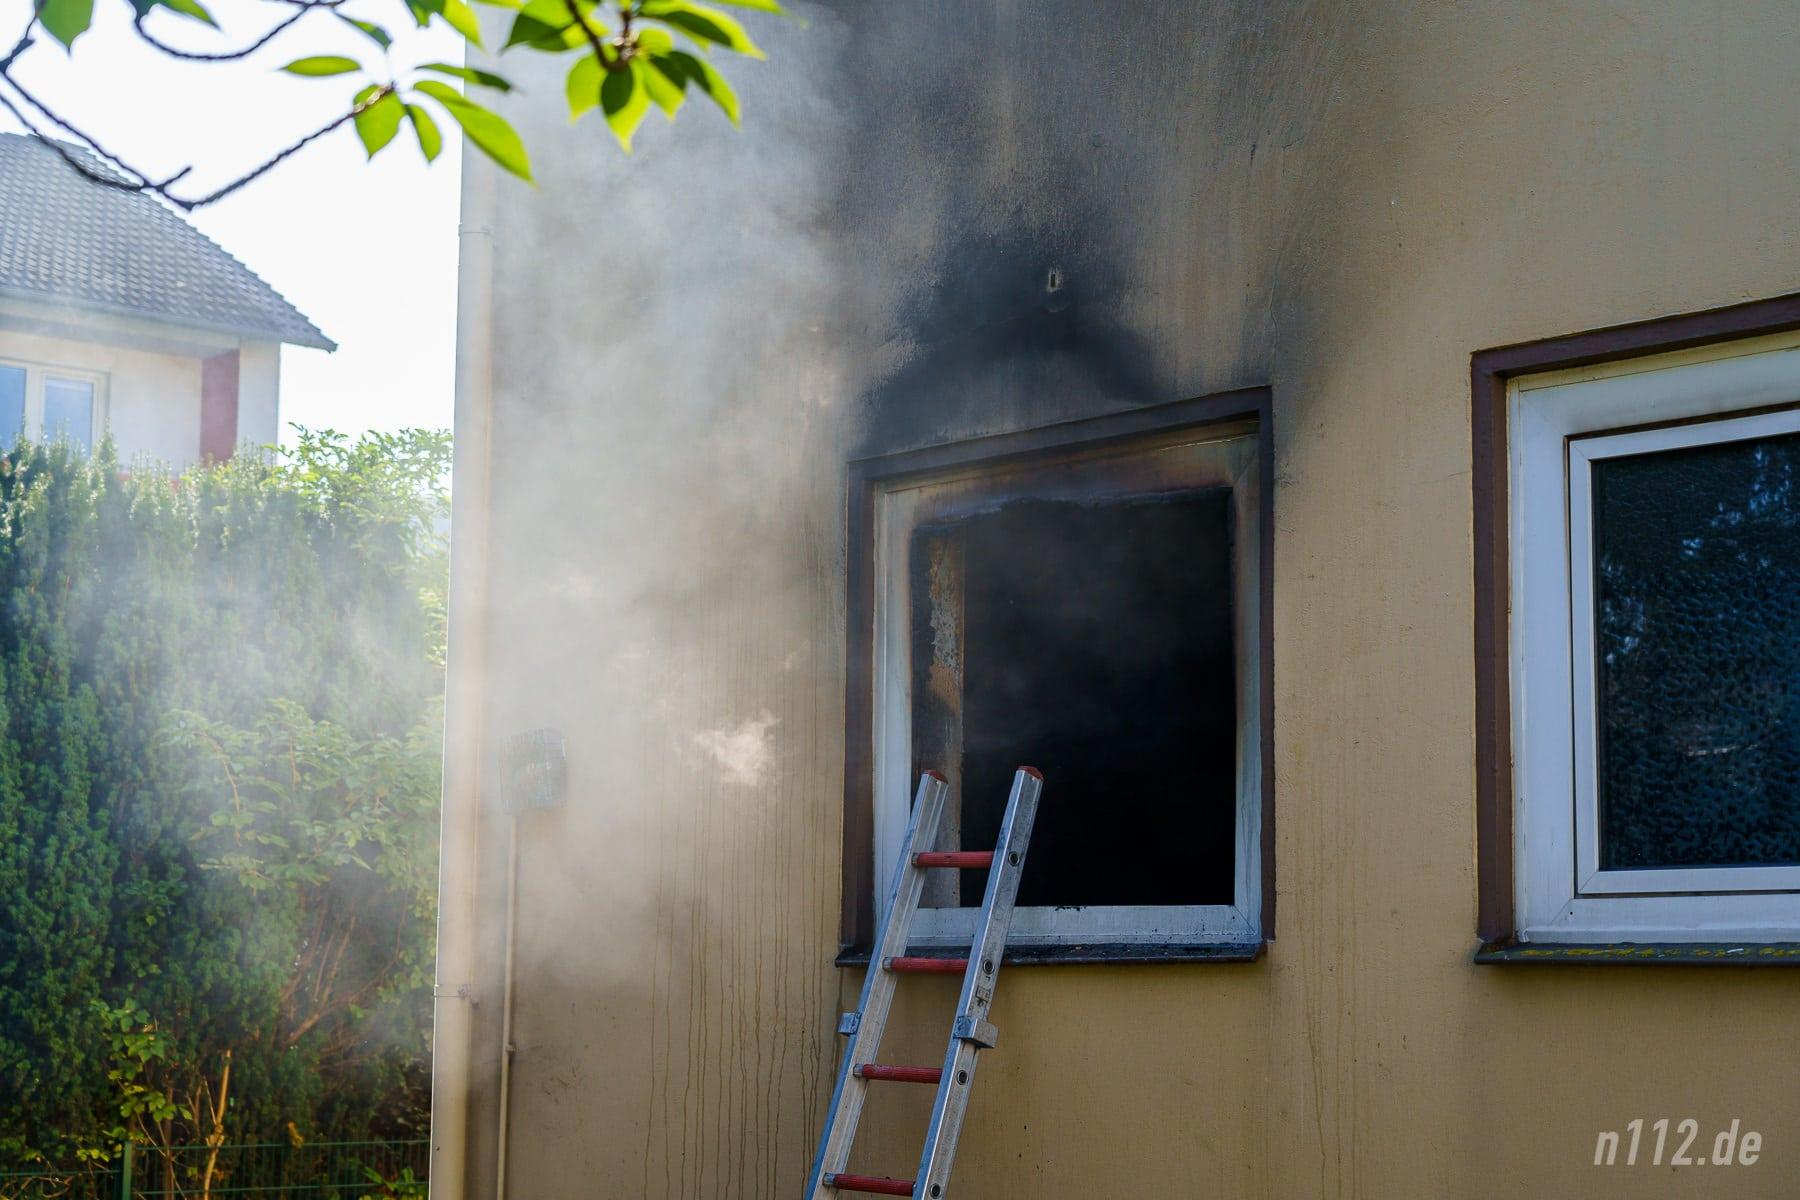 Rauch dringt aus der Erdgeschosswohnung. Die Flammen hatten bereits die Fassade geschwärzt (Foto: n112.de/Stefan Simonsen)